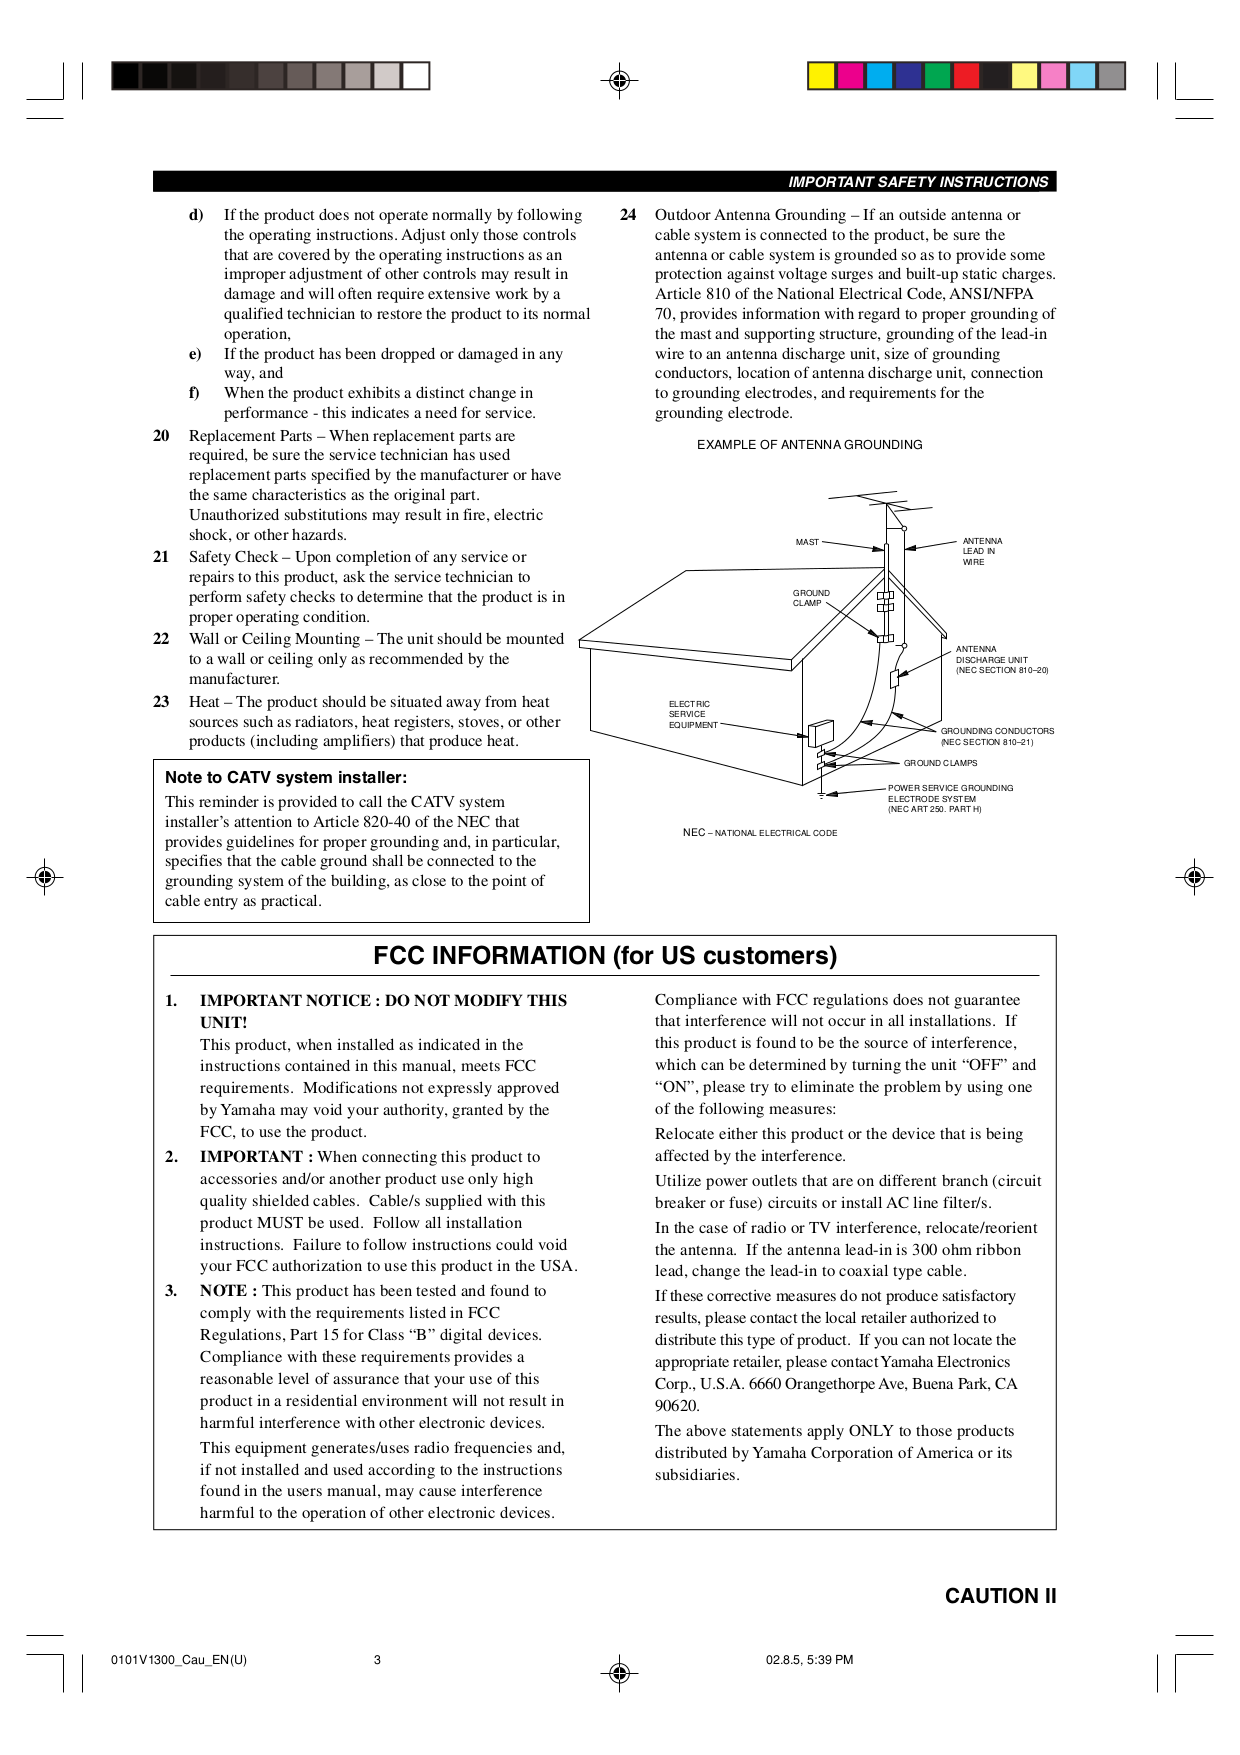 yamaha rx 125 manual pdf